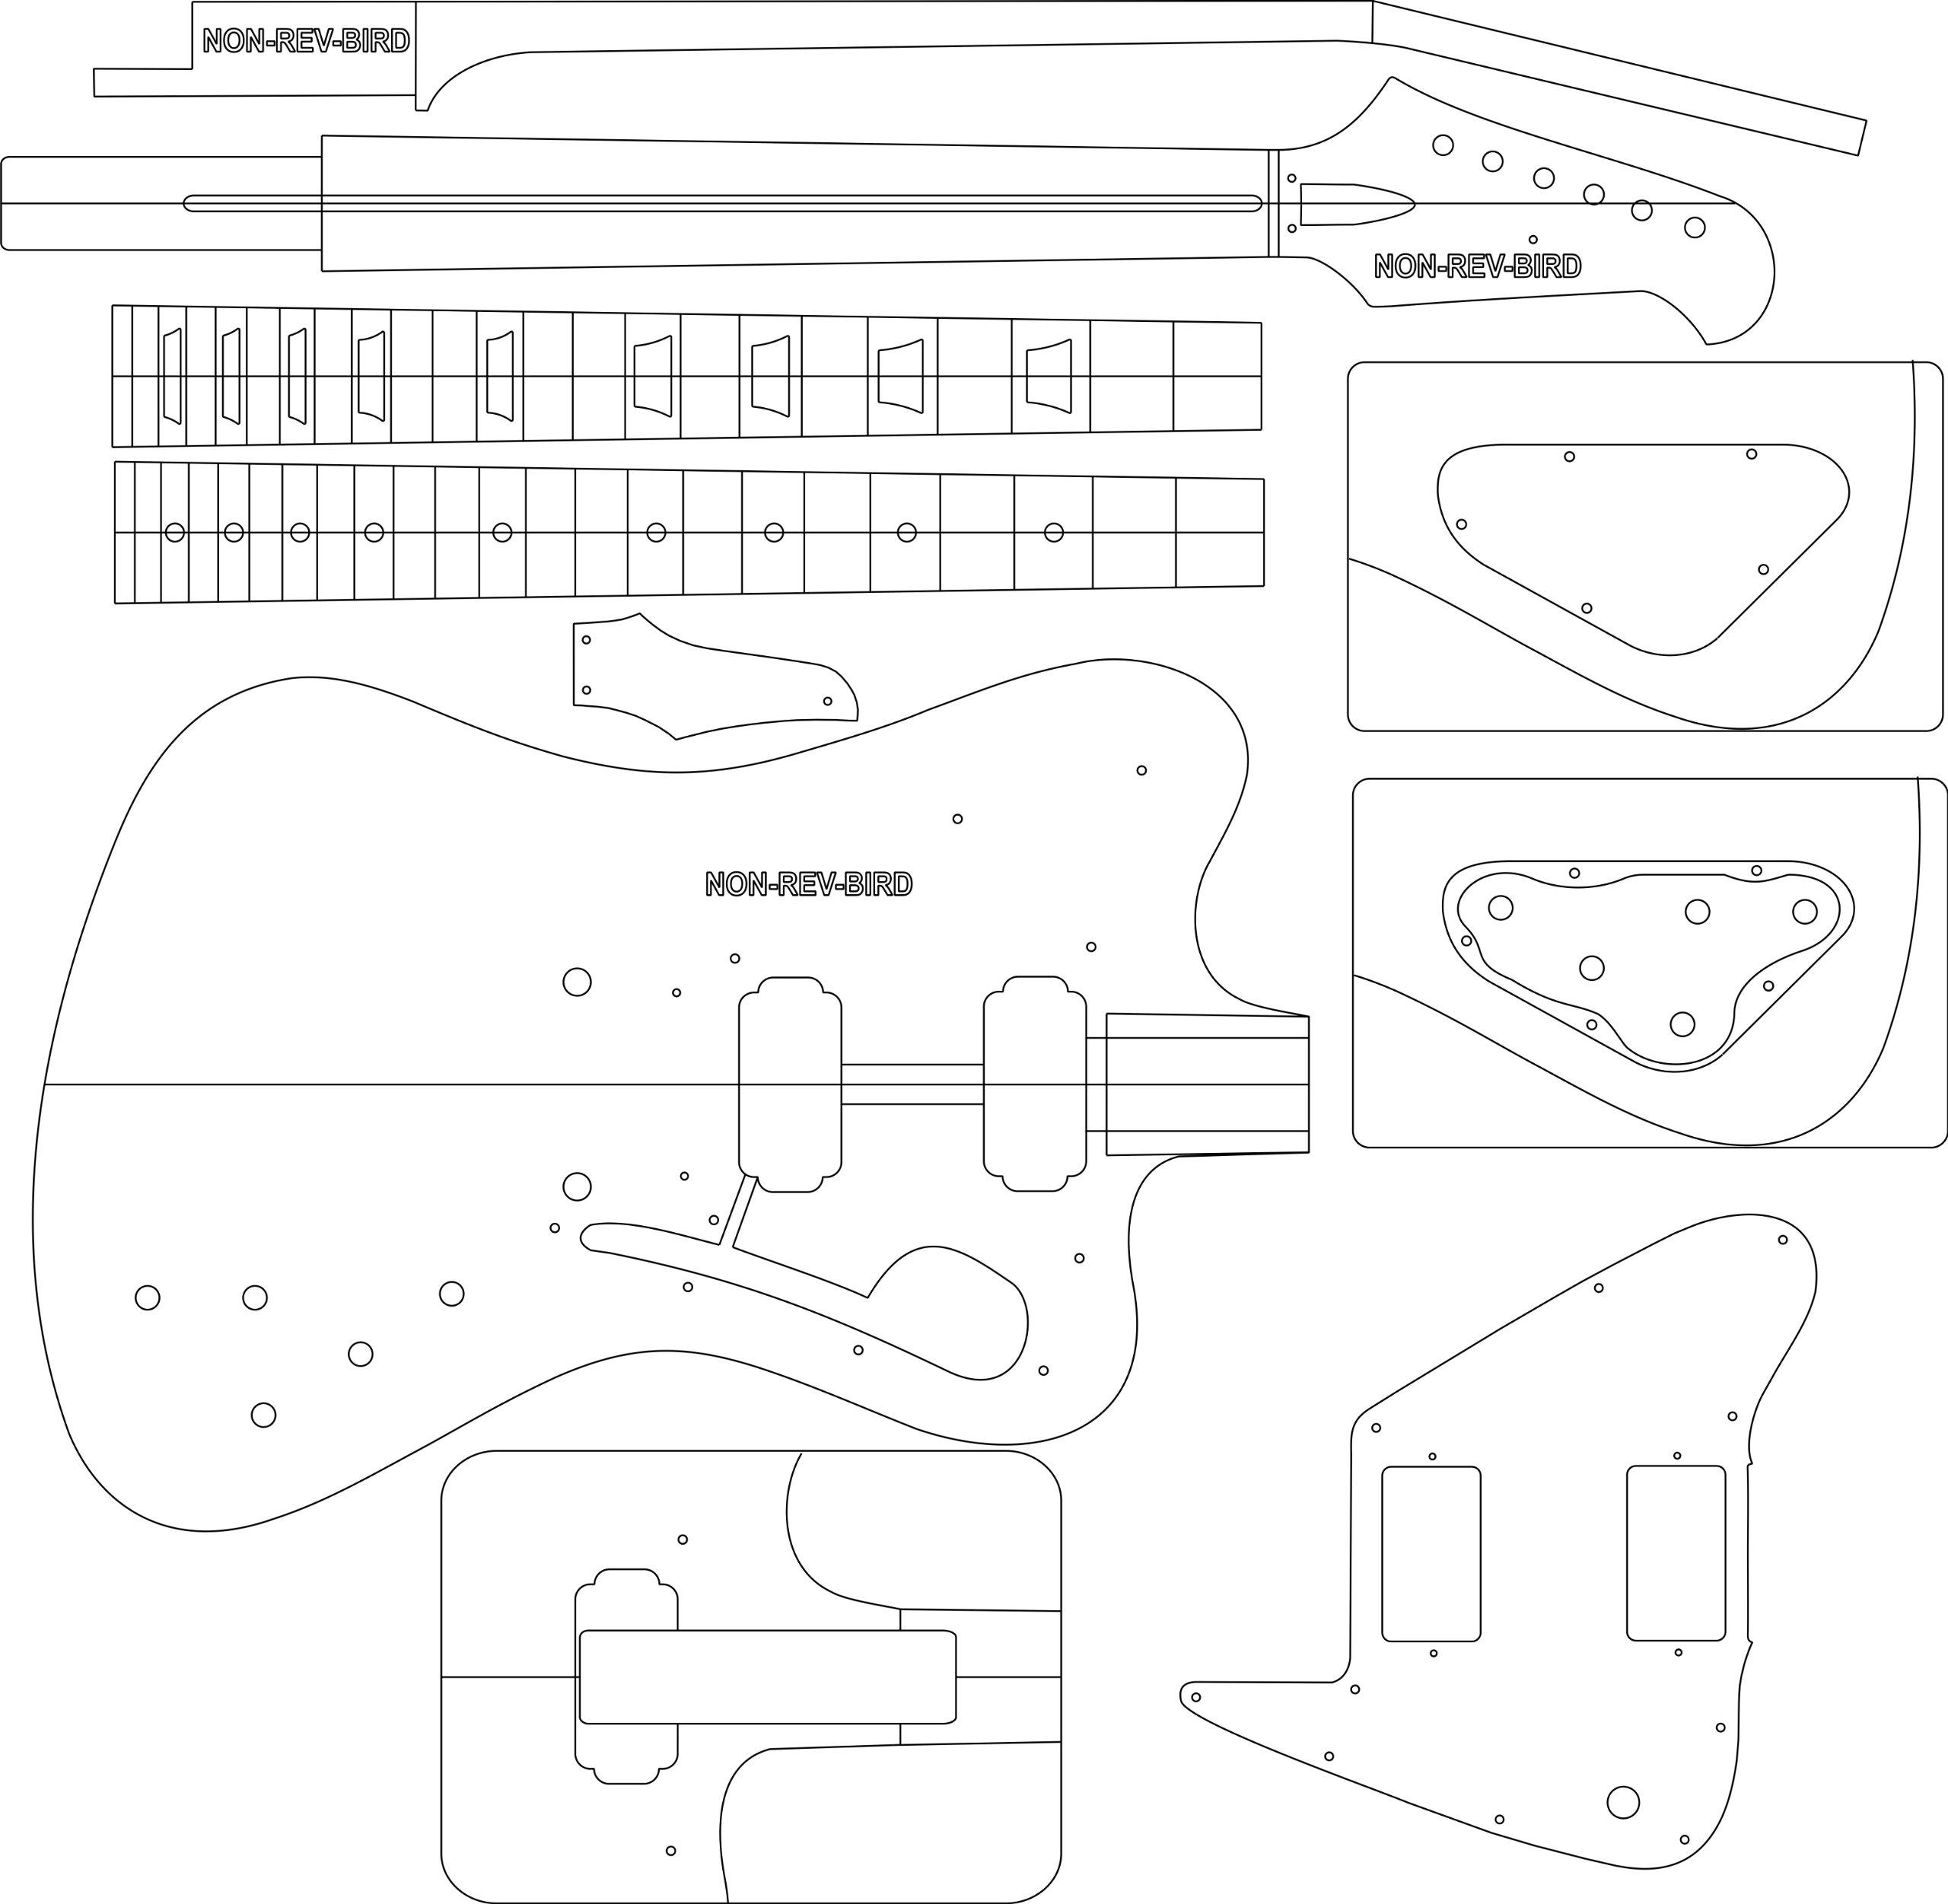 Electric Guitar Layout Template - NON REV FBIRD HUM